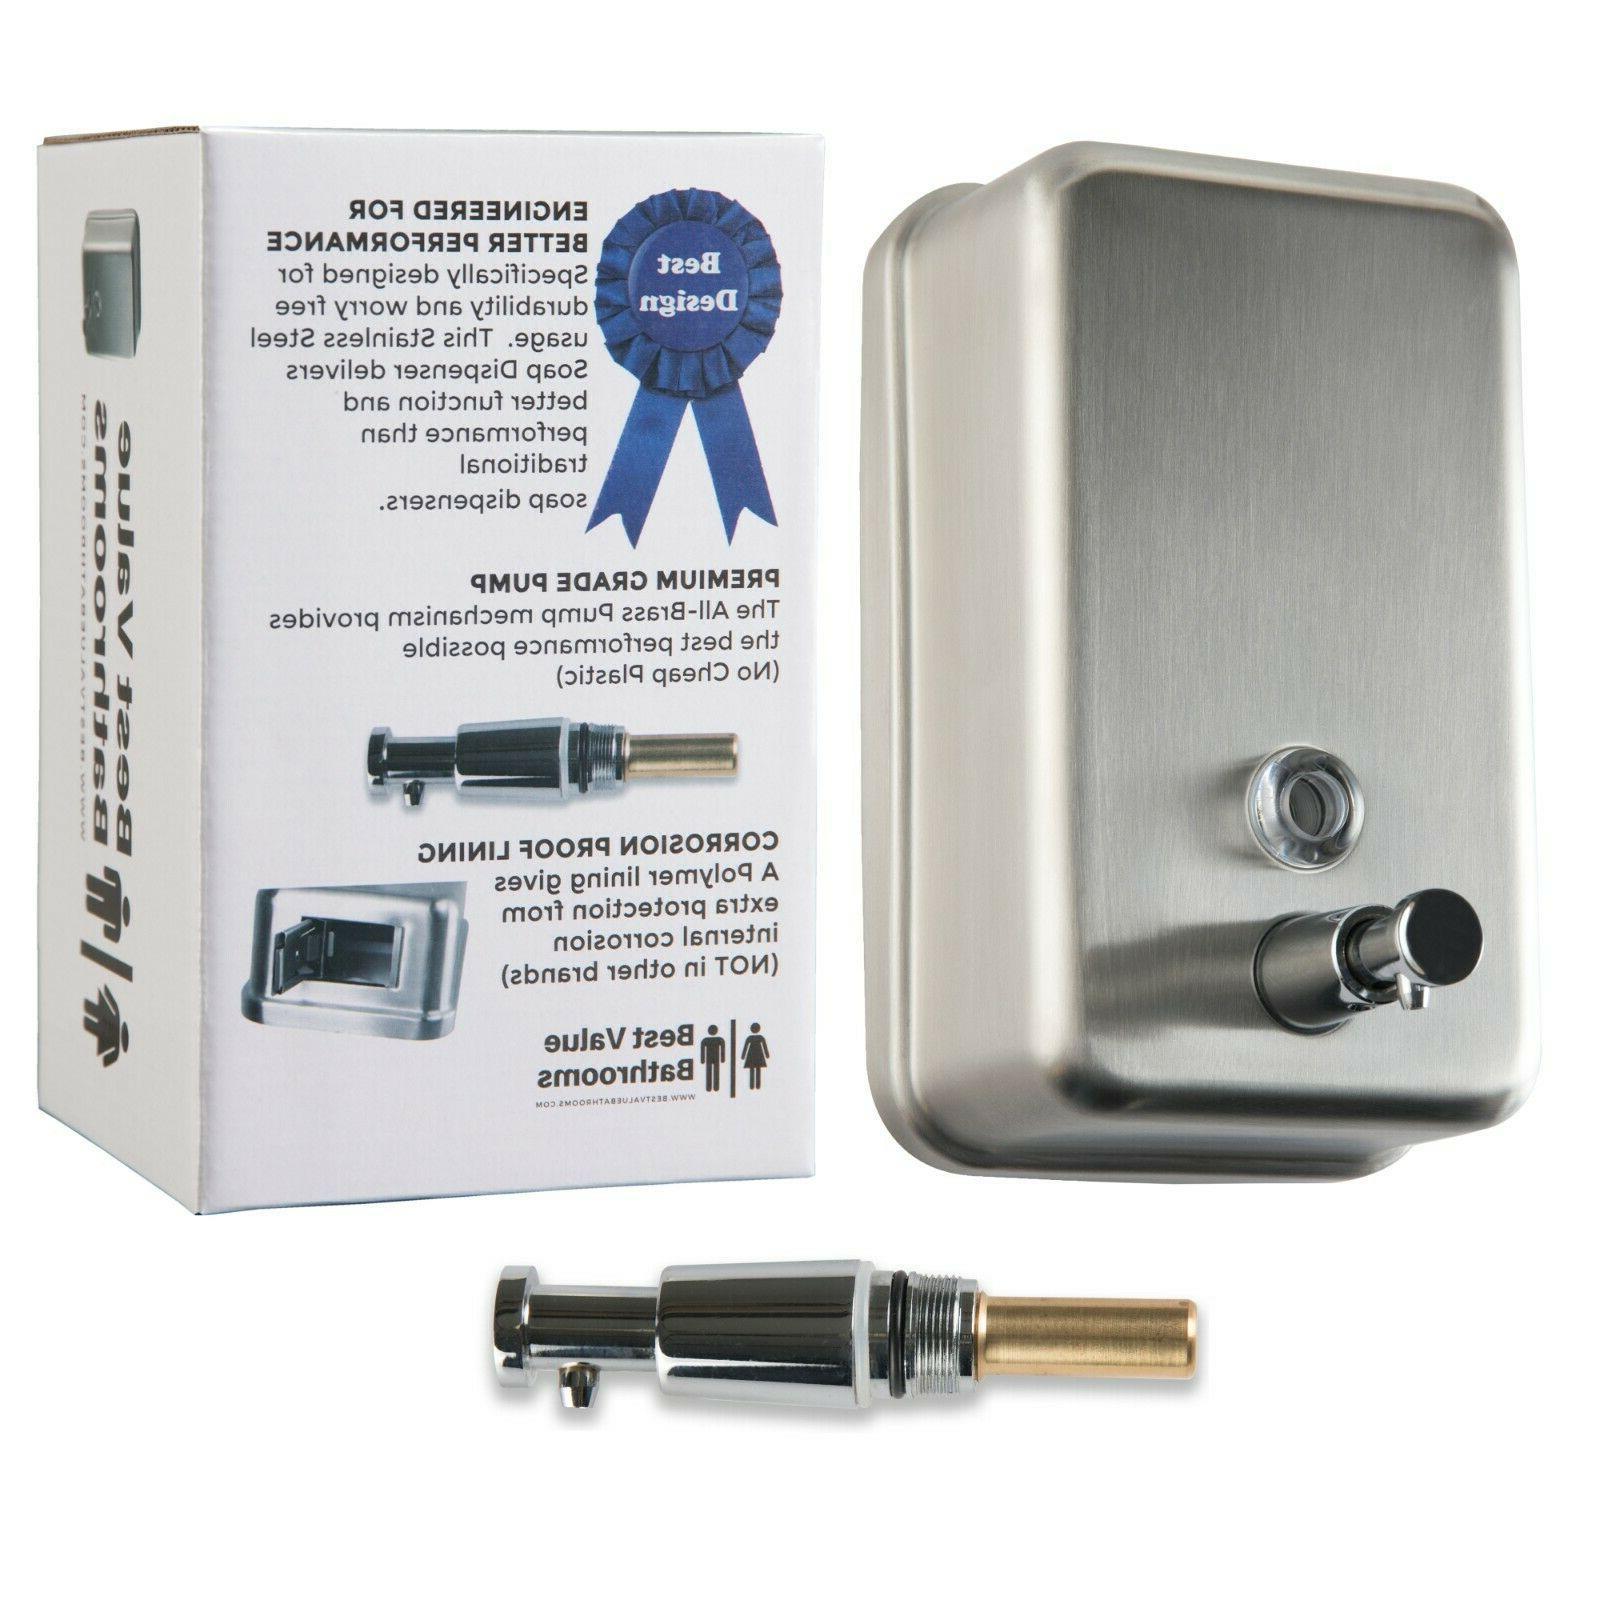 Commercial Dispenser Mount - Steel - Design